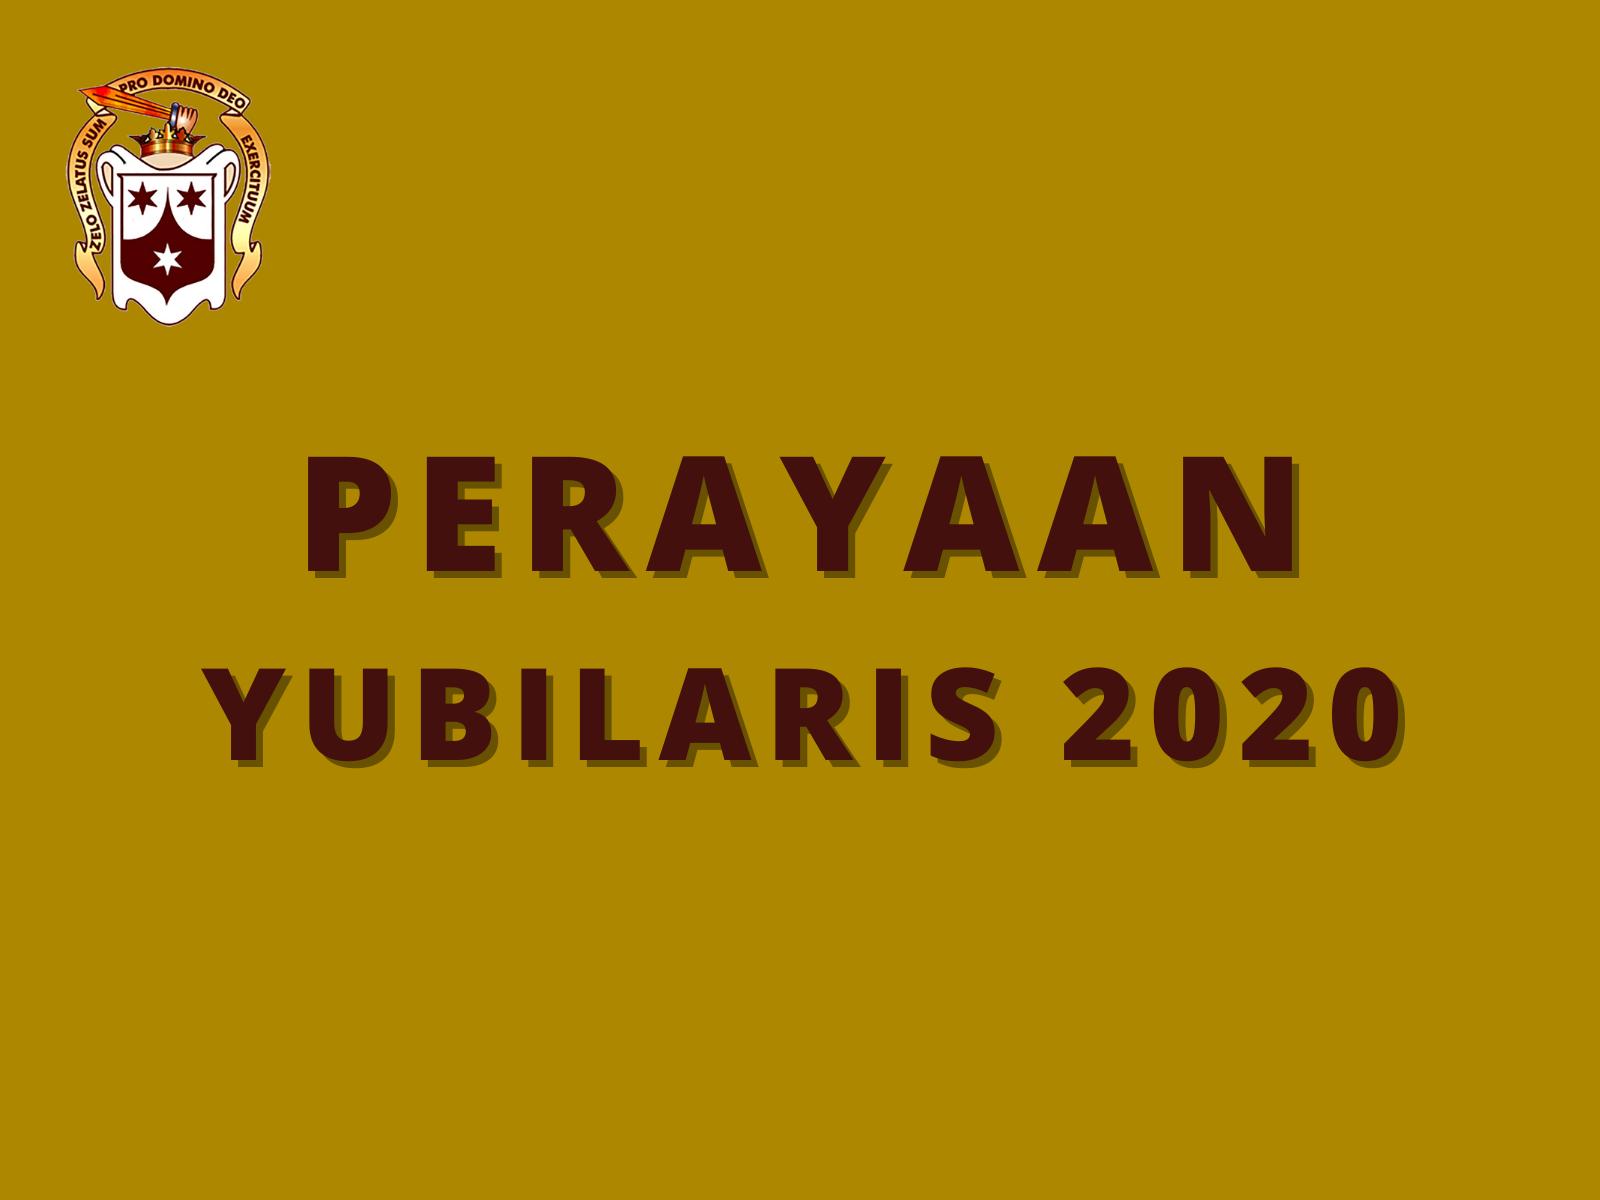 Perayaan Yubilaris 2020